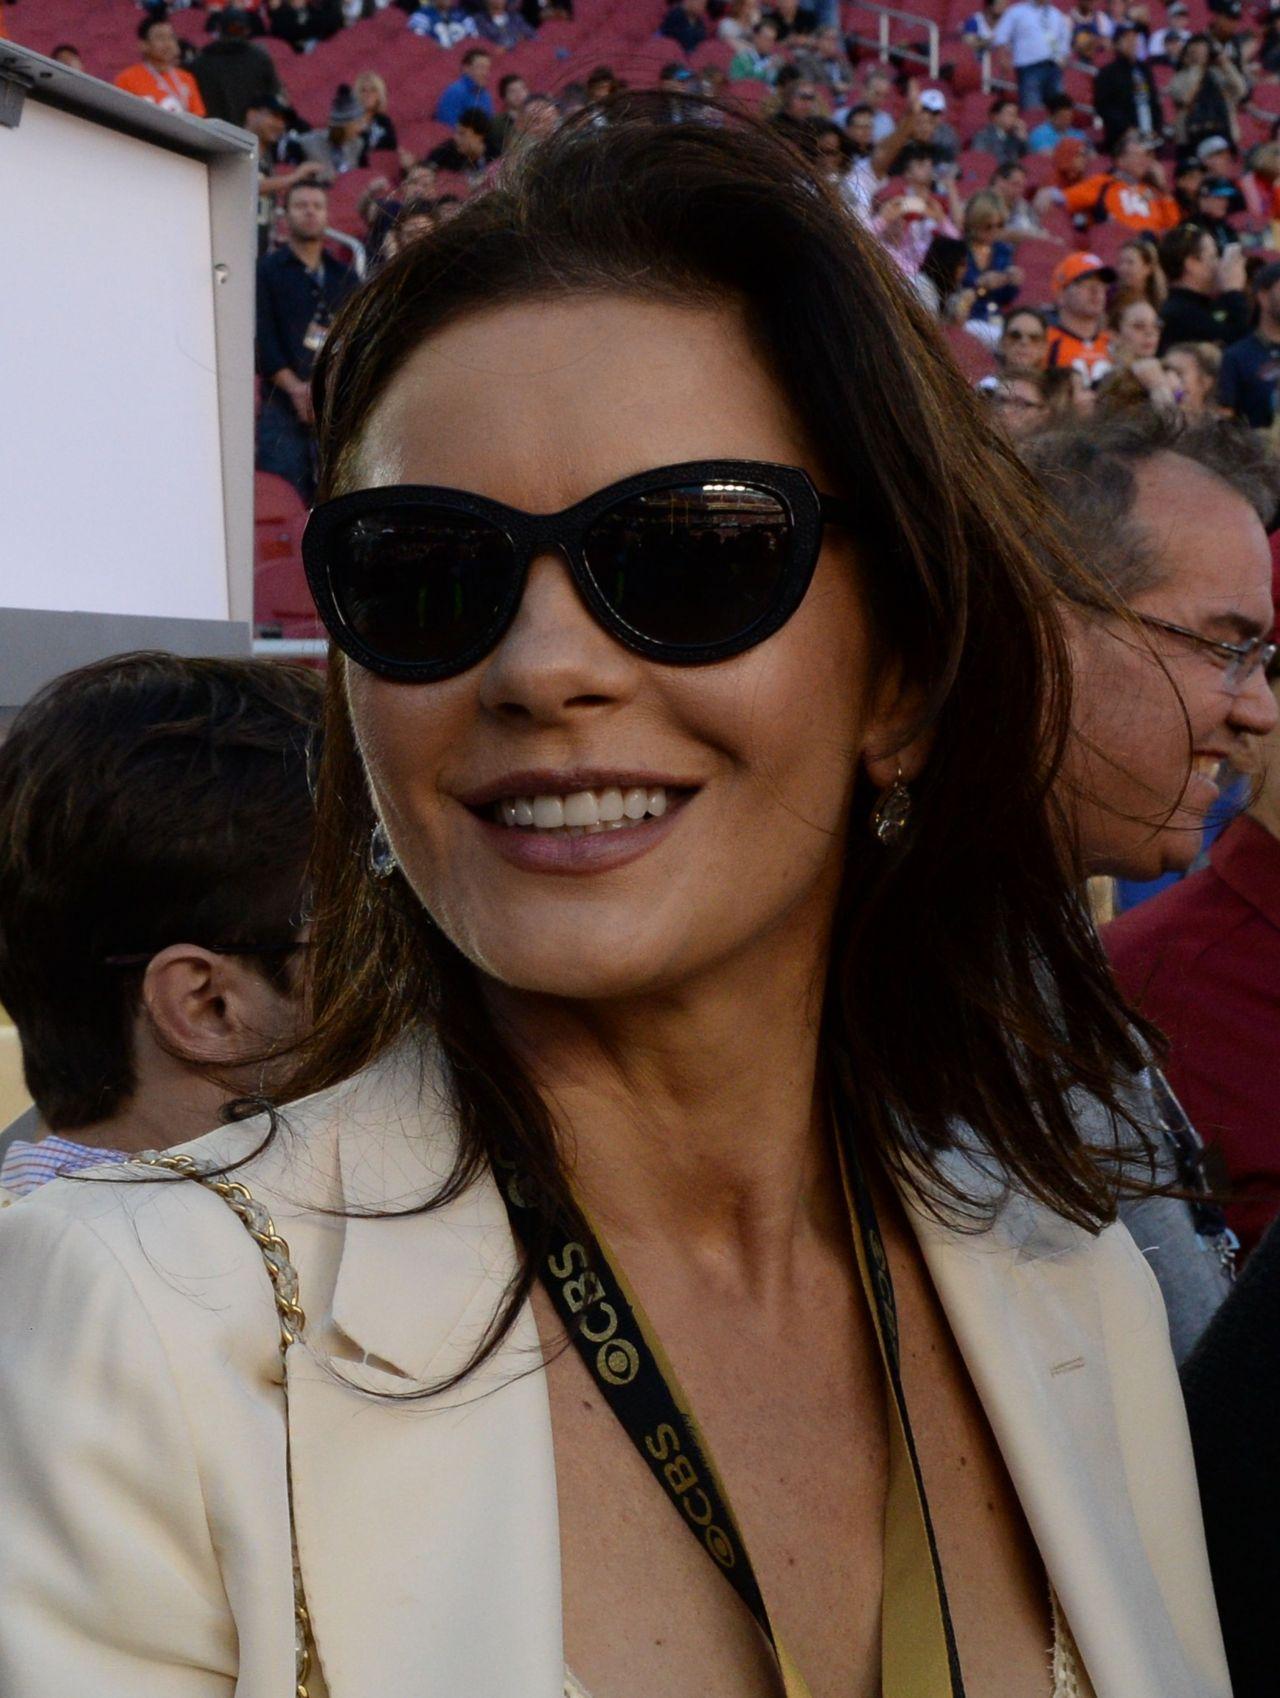 Catherine Zeta-Jones and Michael Douglas - Super Bowl 50 in Santa Clara, CA